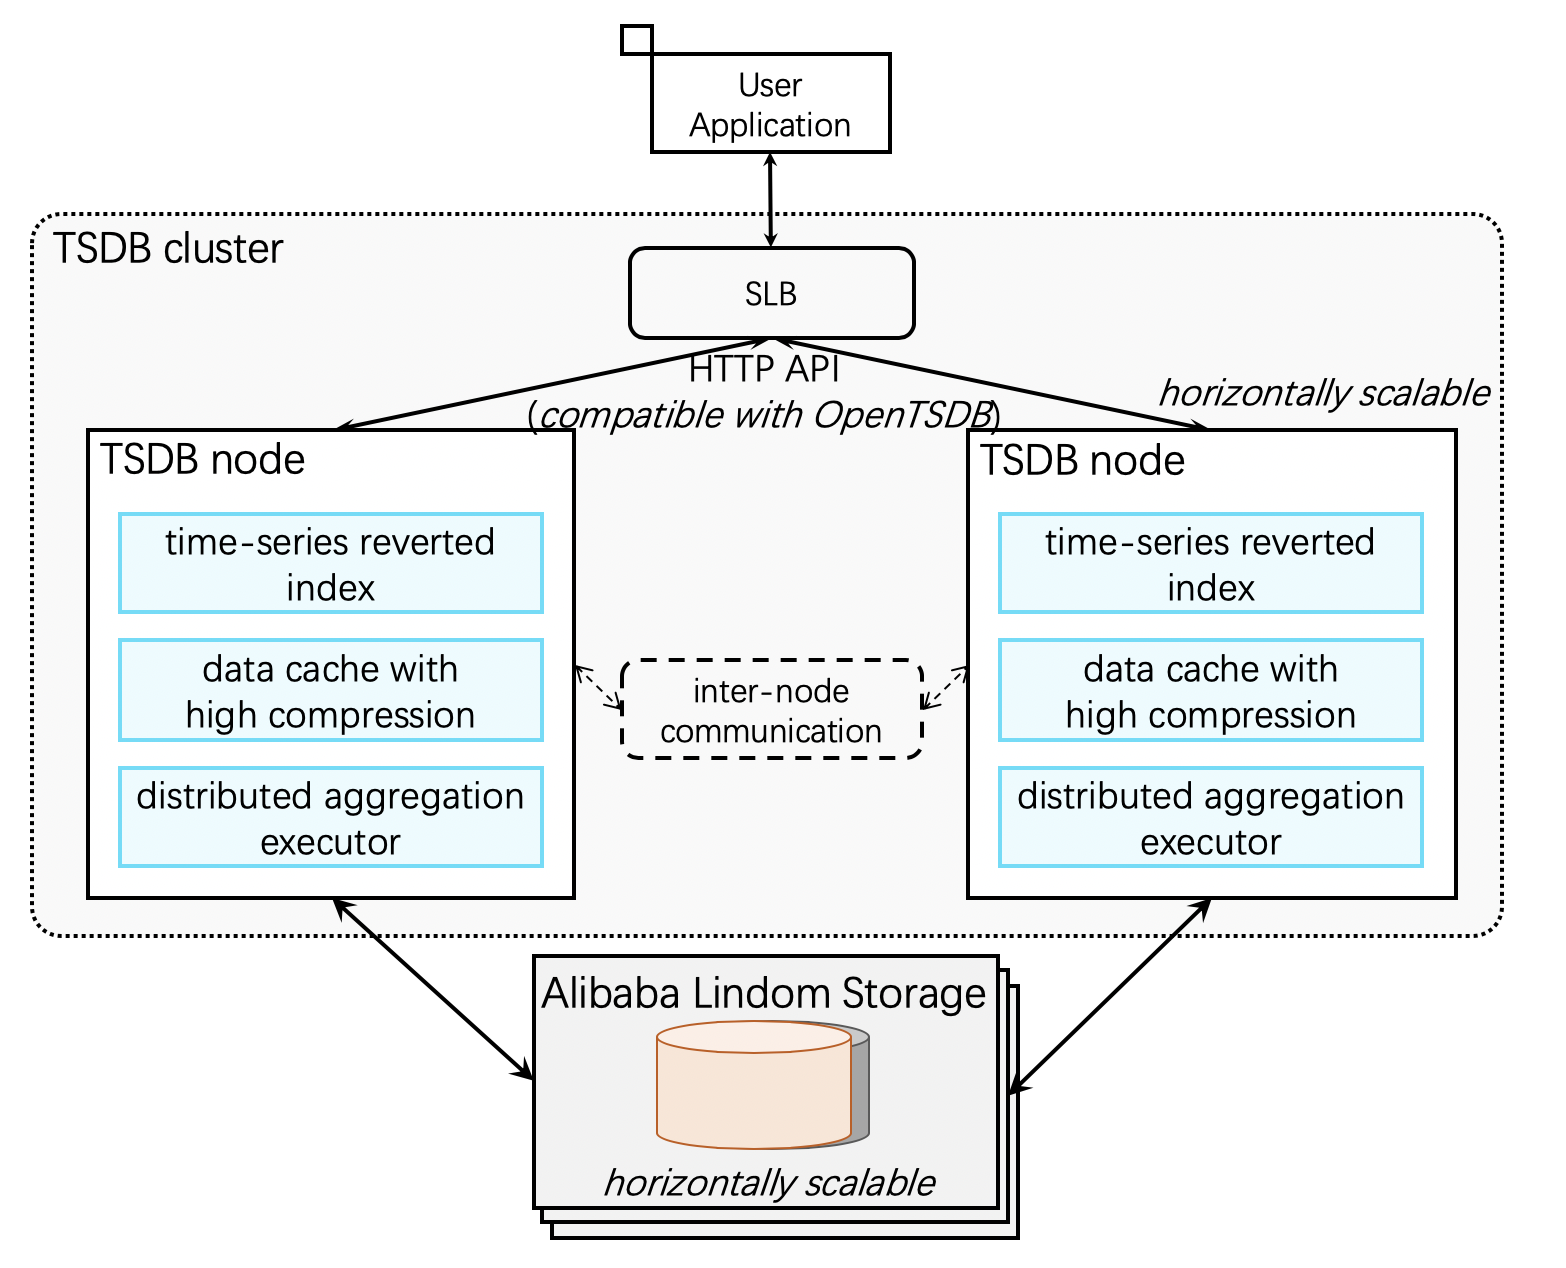 architecture_of_TSDB